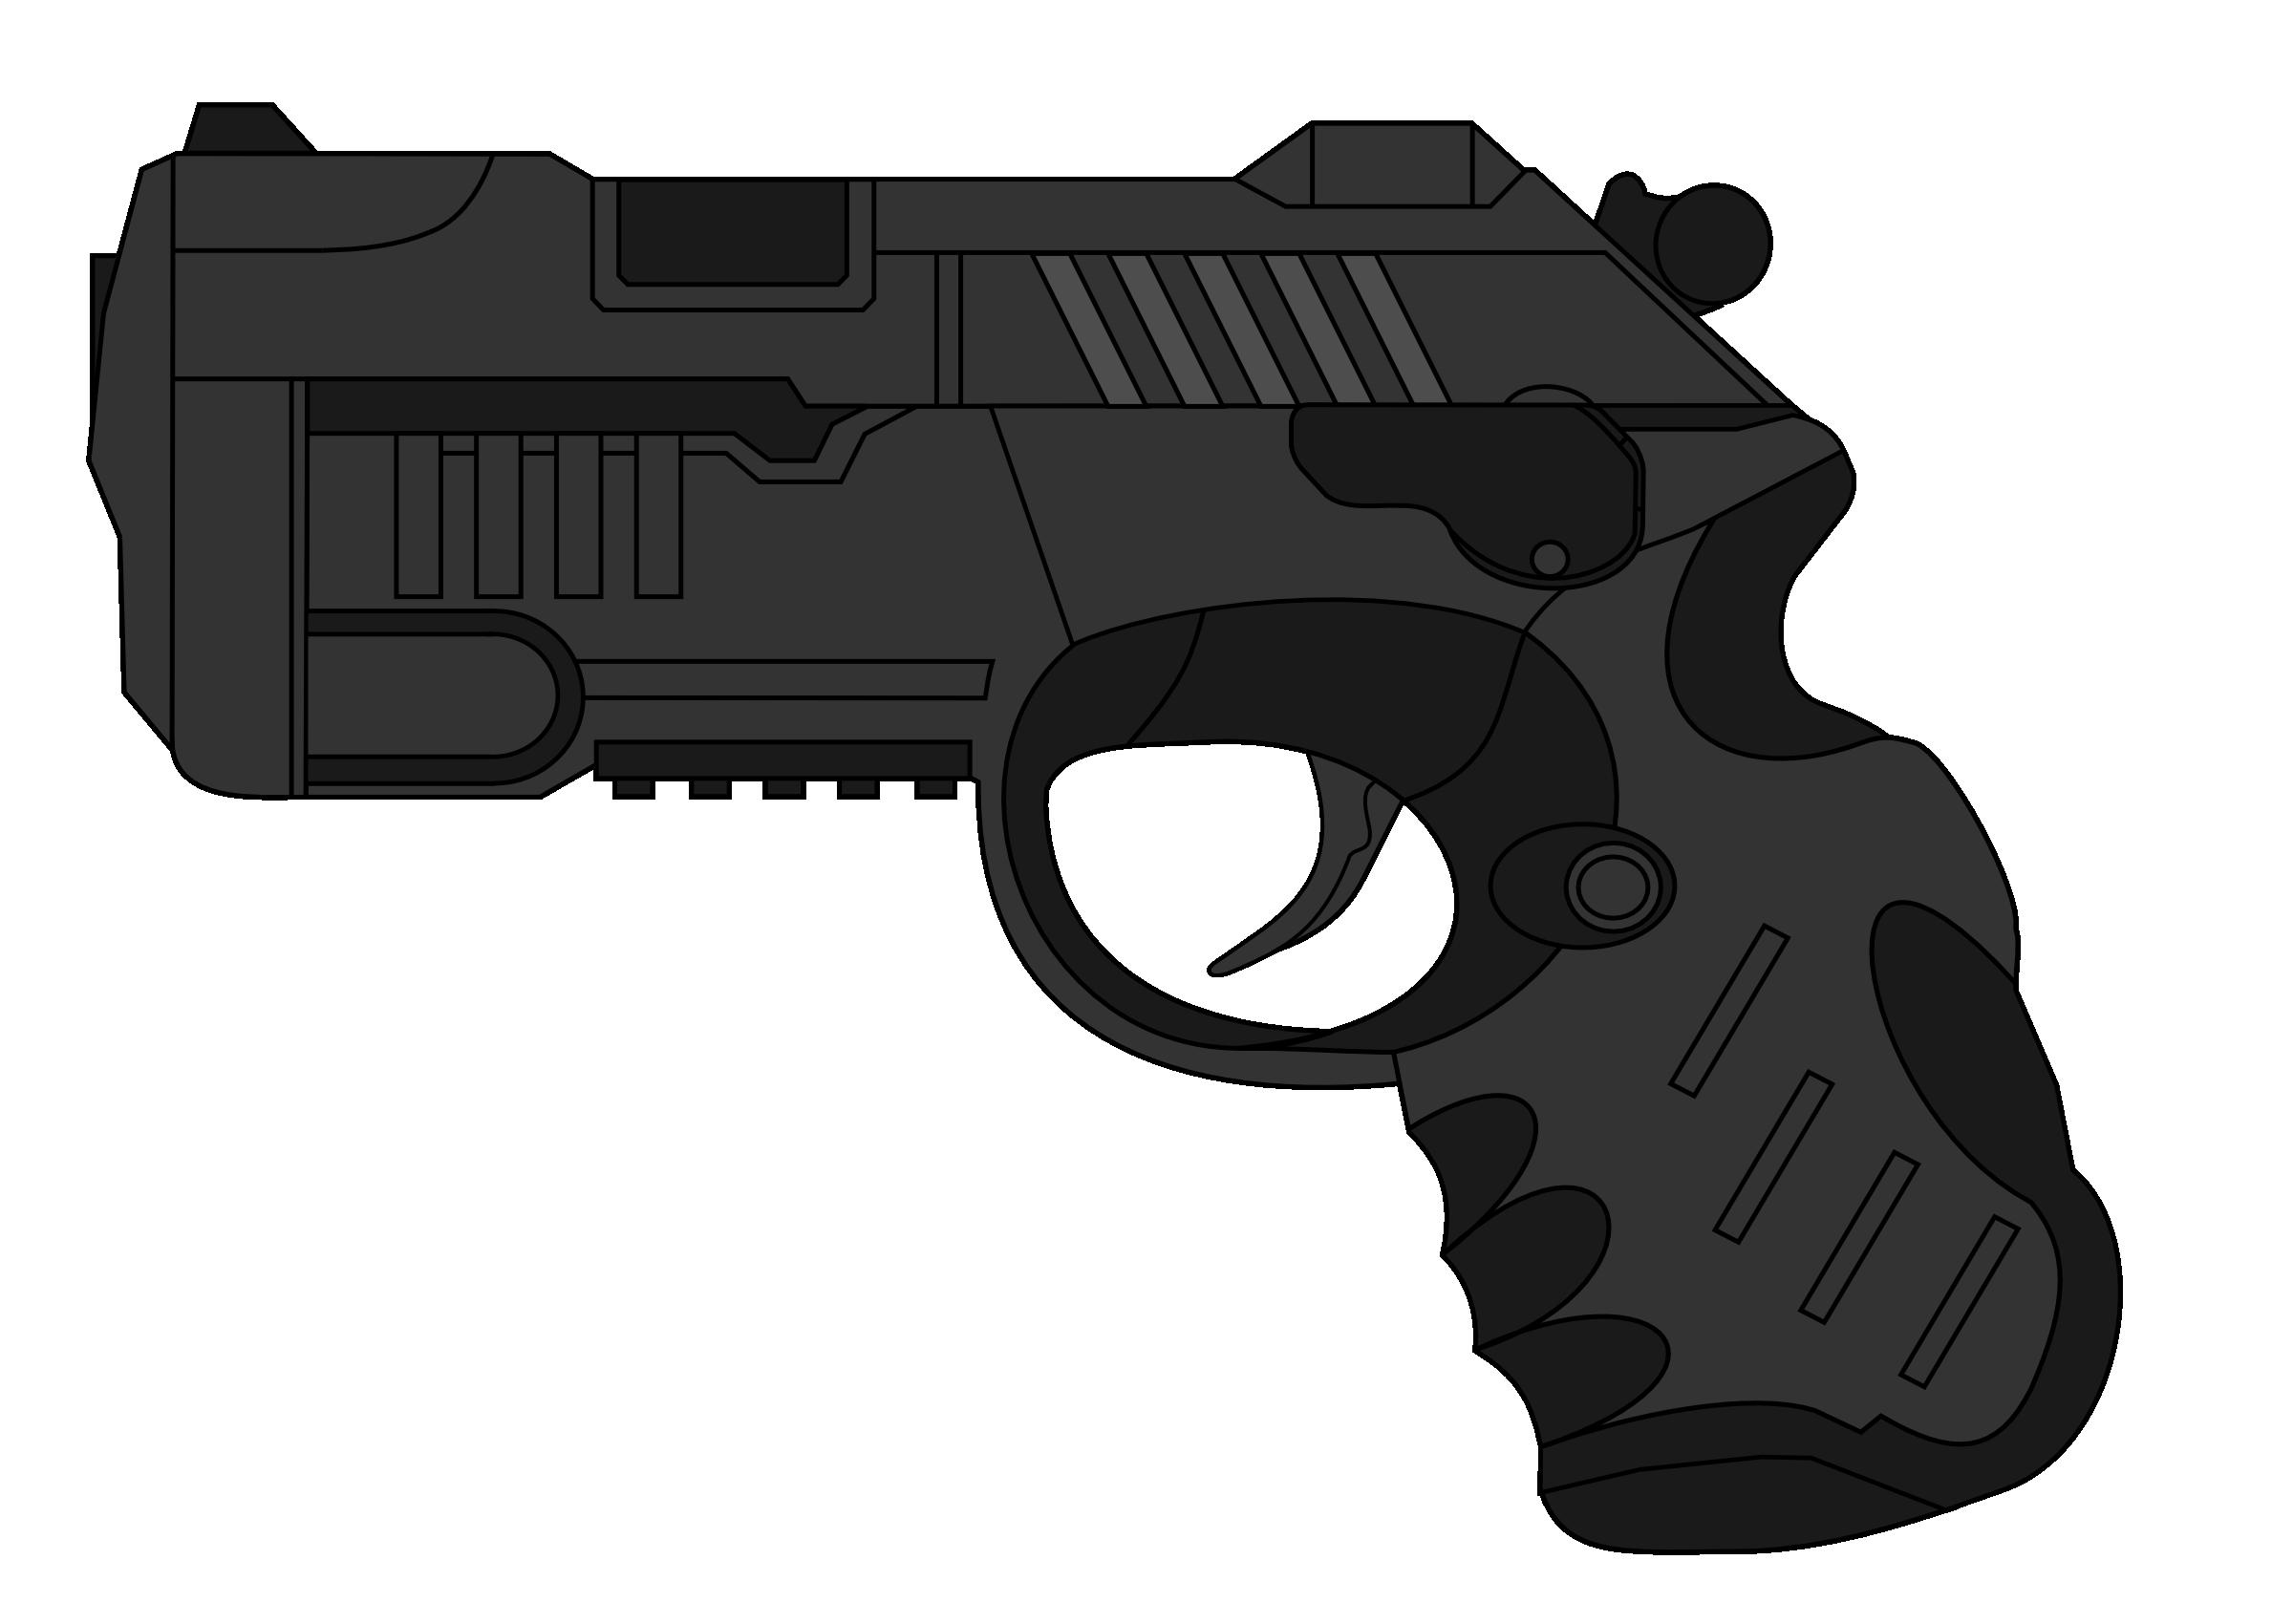 M21 Pistol